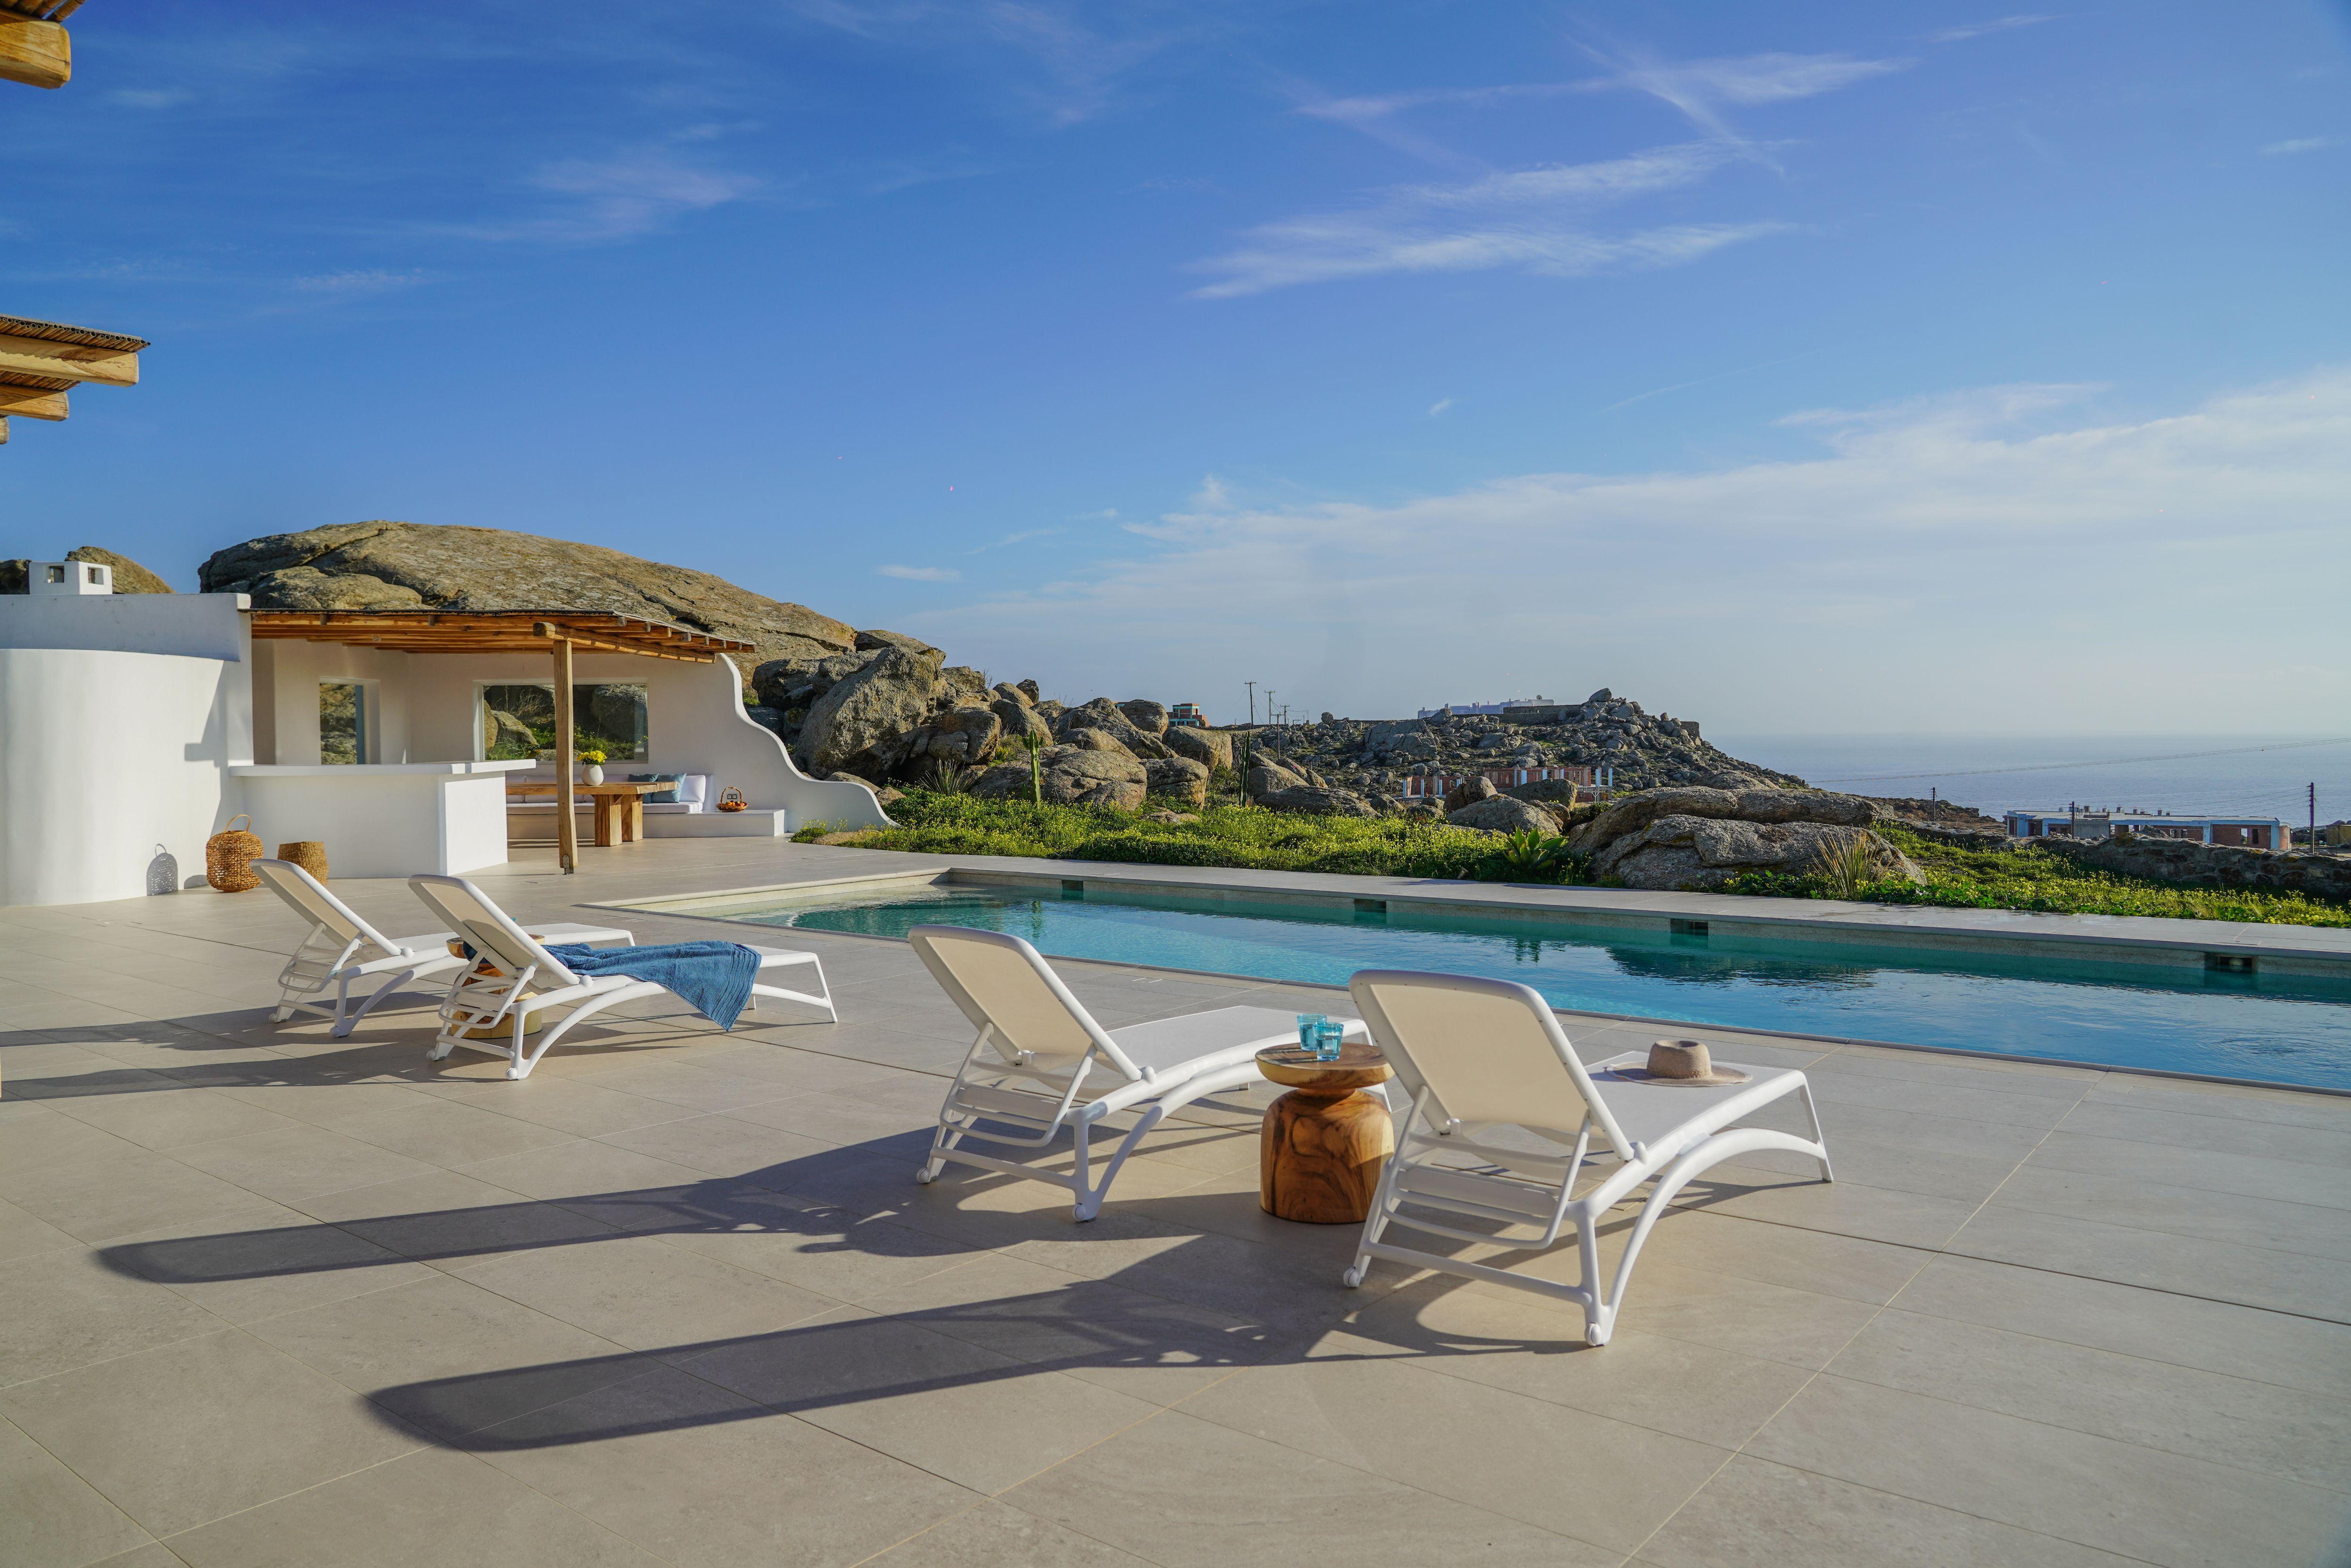 villa ithra super paradise pool